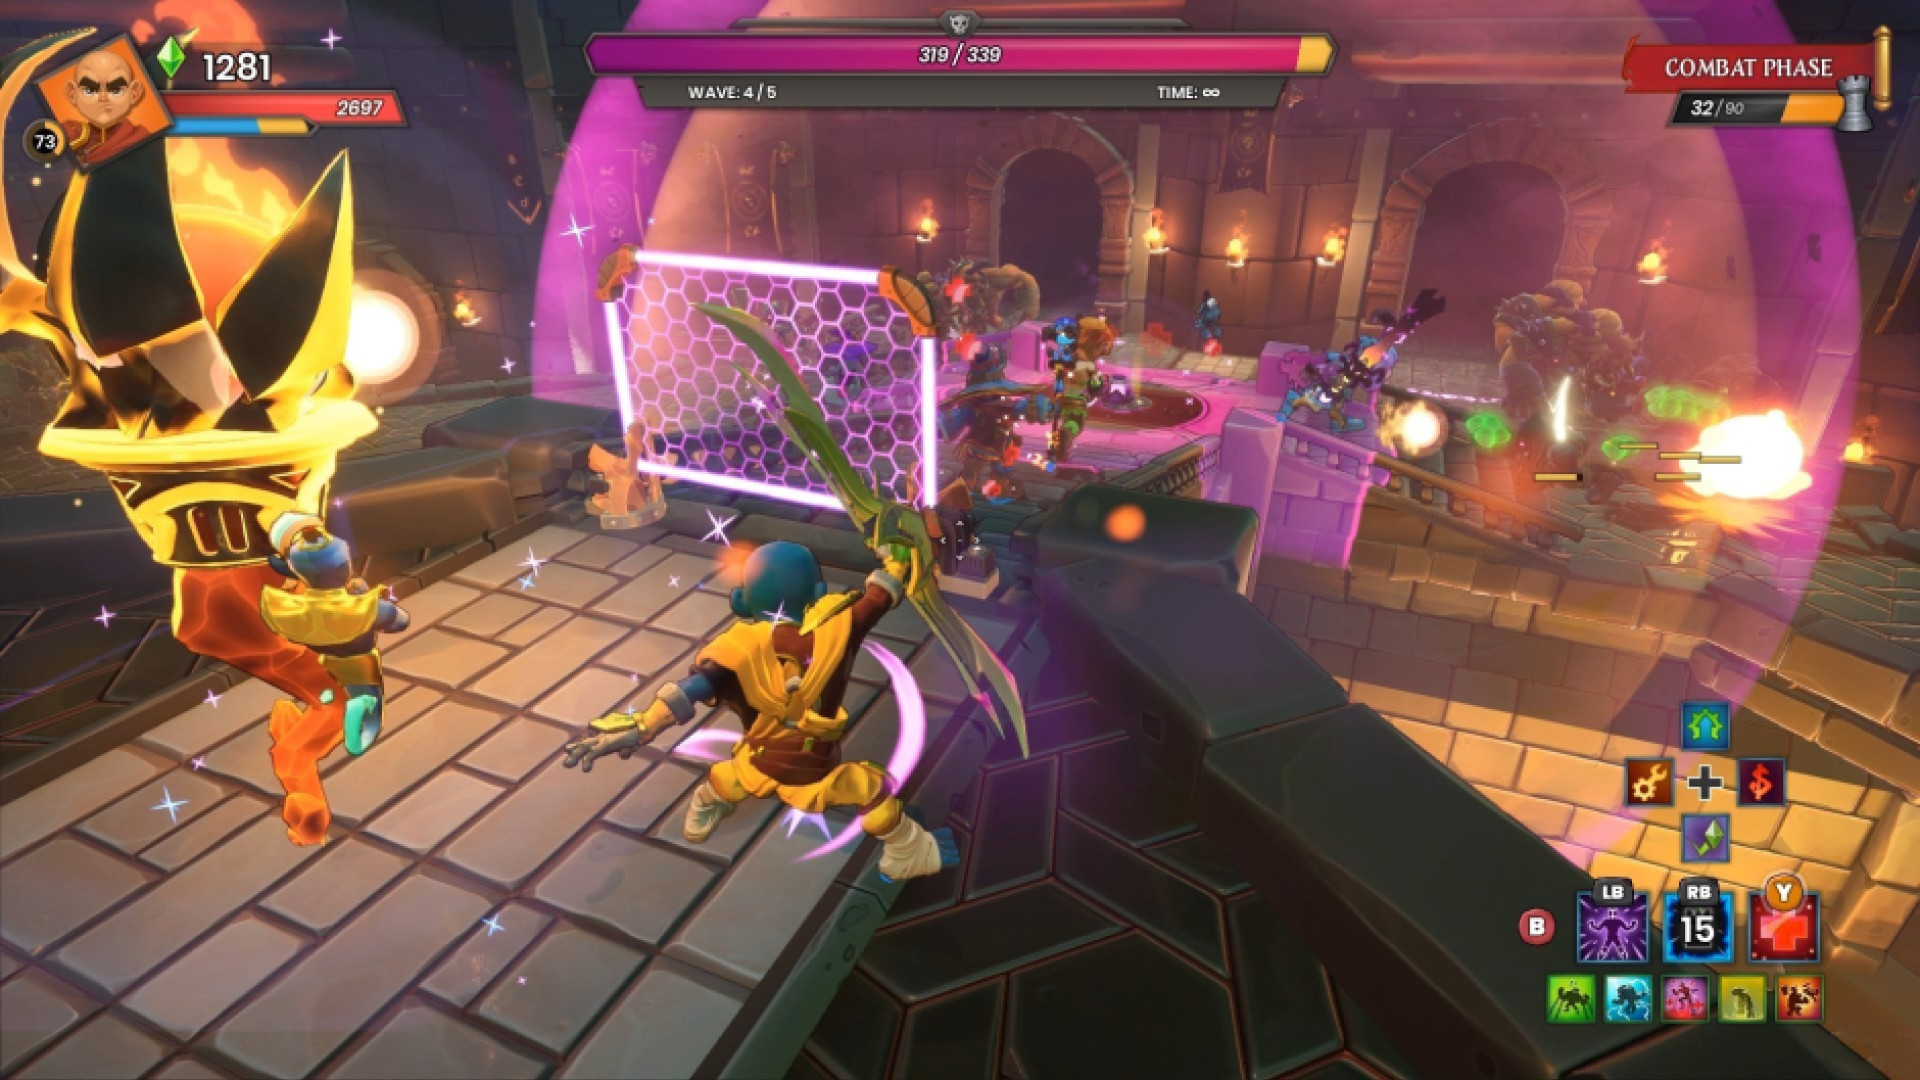 Dungeon Defenders: Awakened - March 17